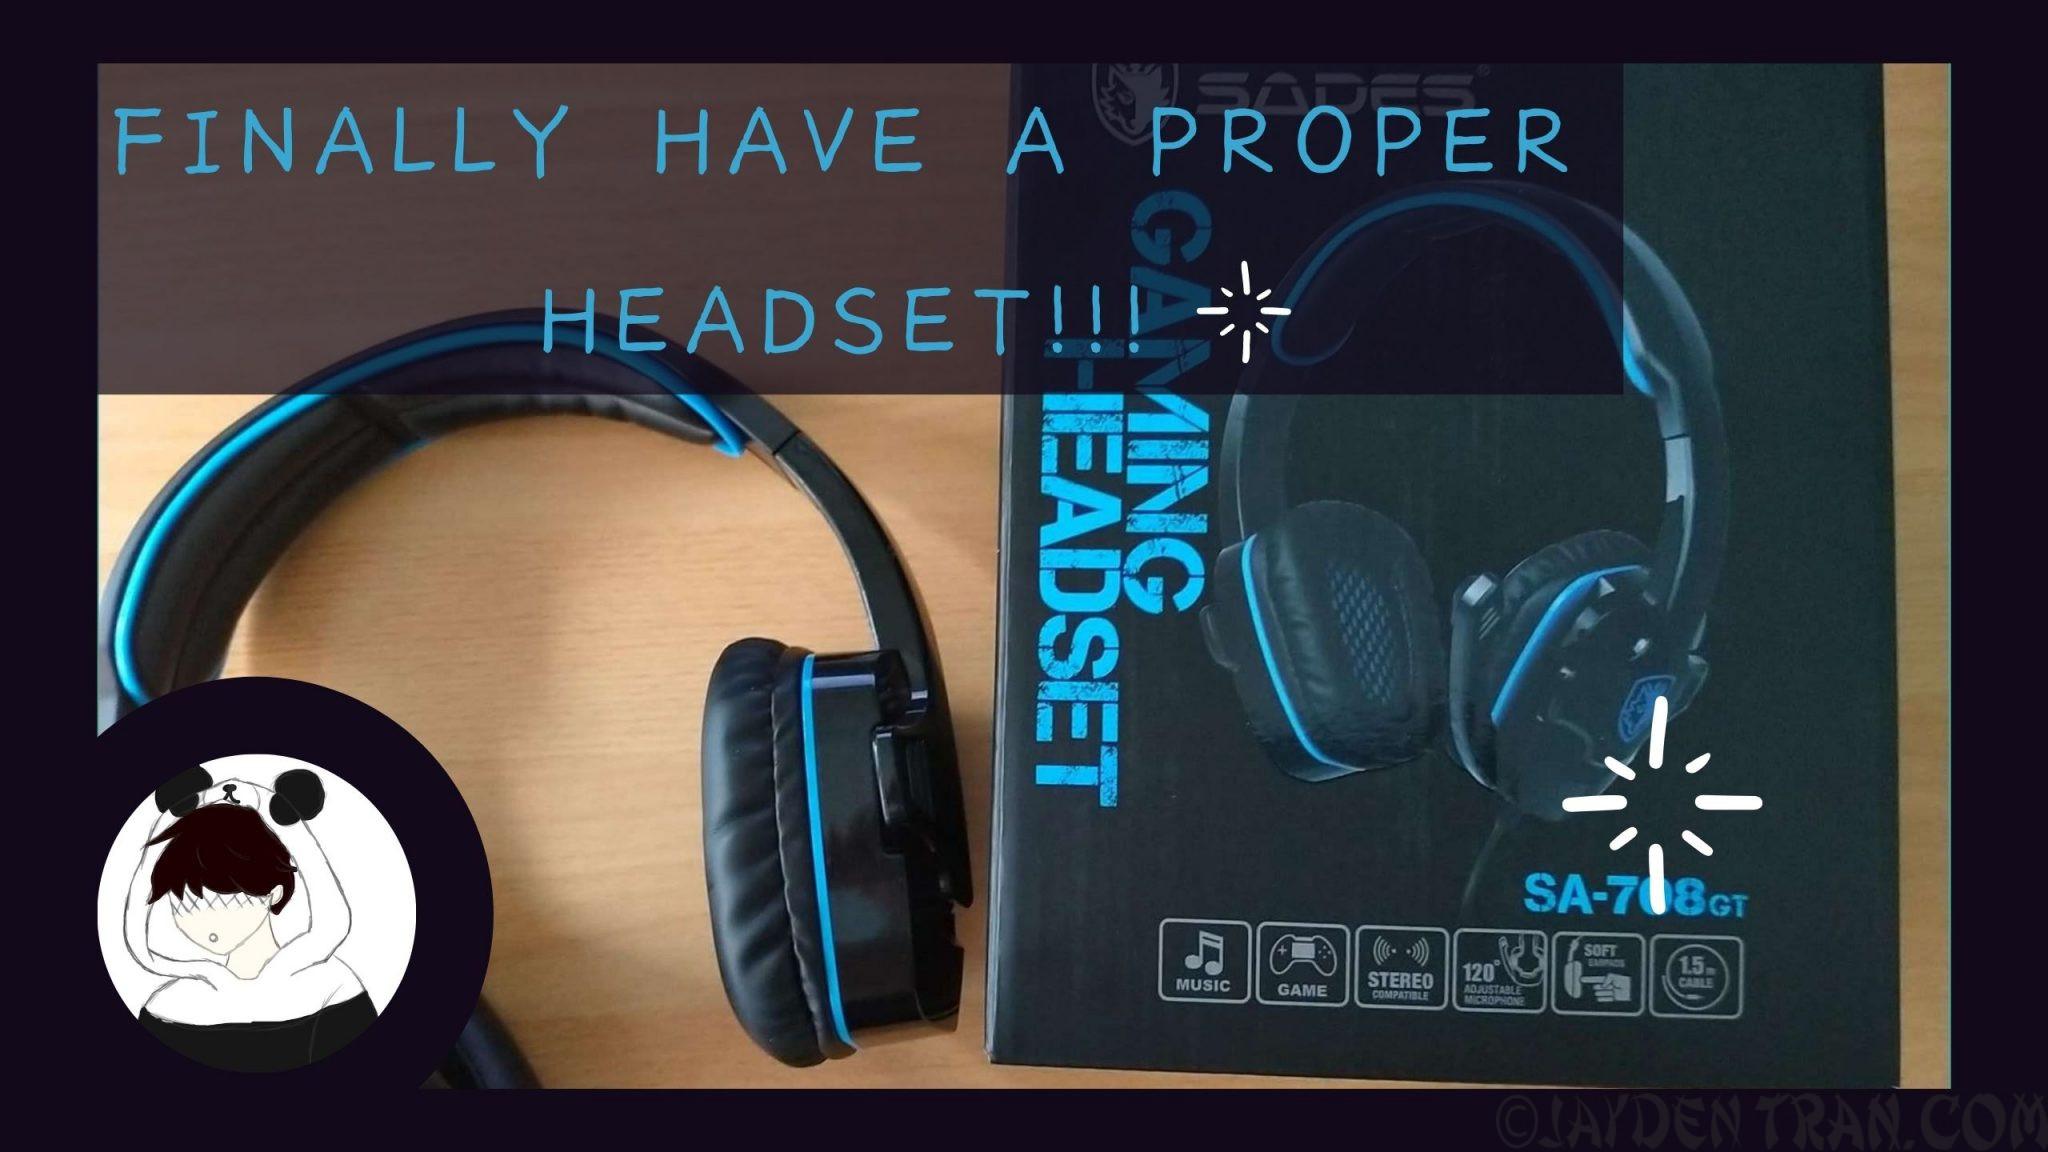 SADES SA-708GT Gaming Headset Review and Unboxing